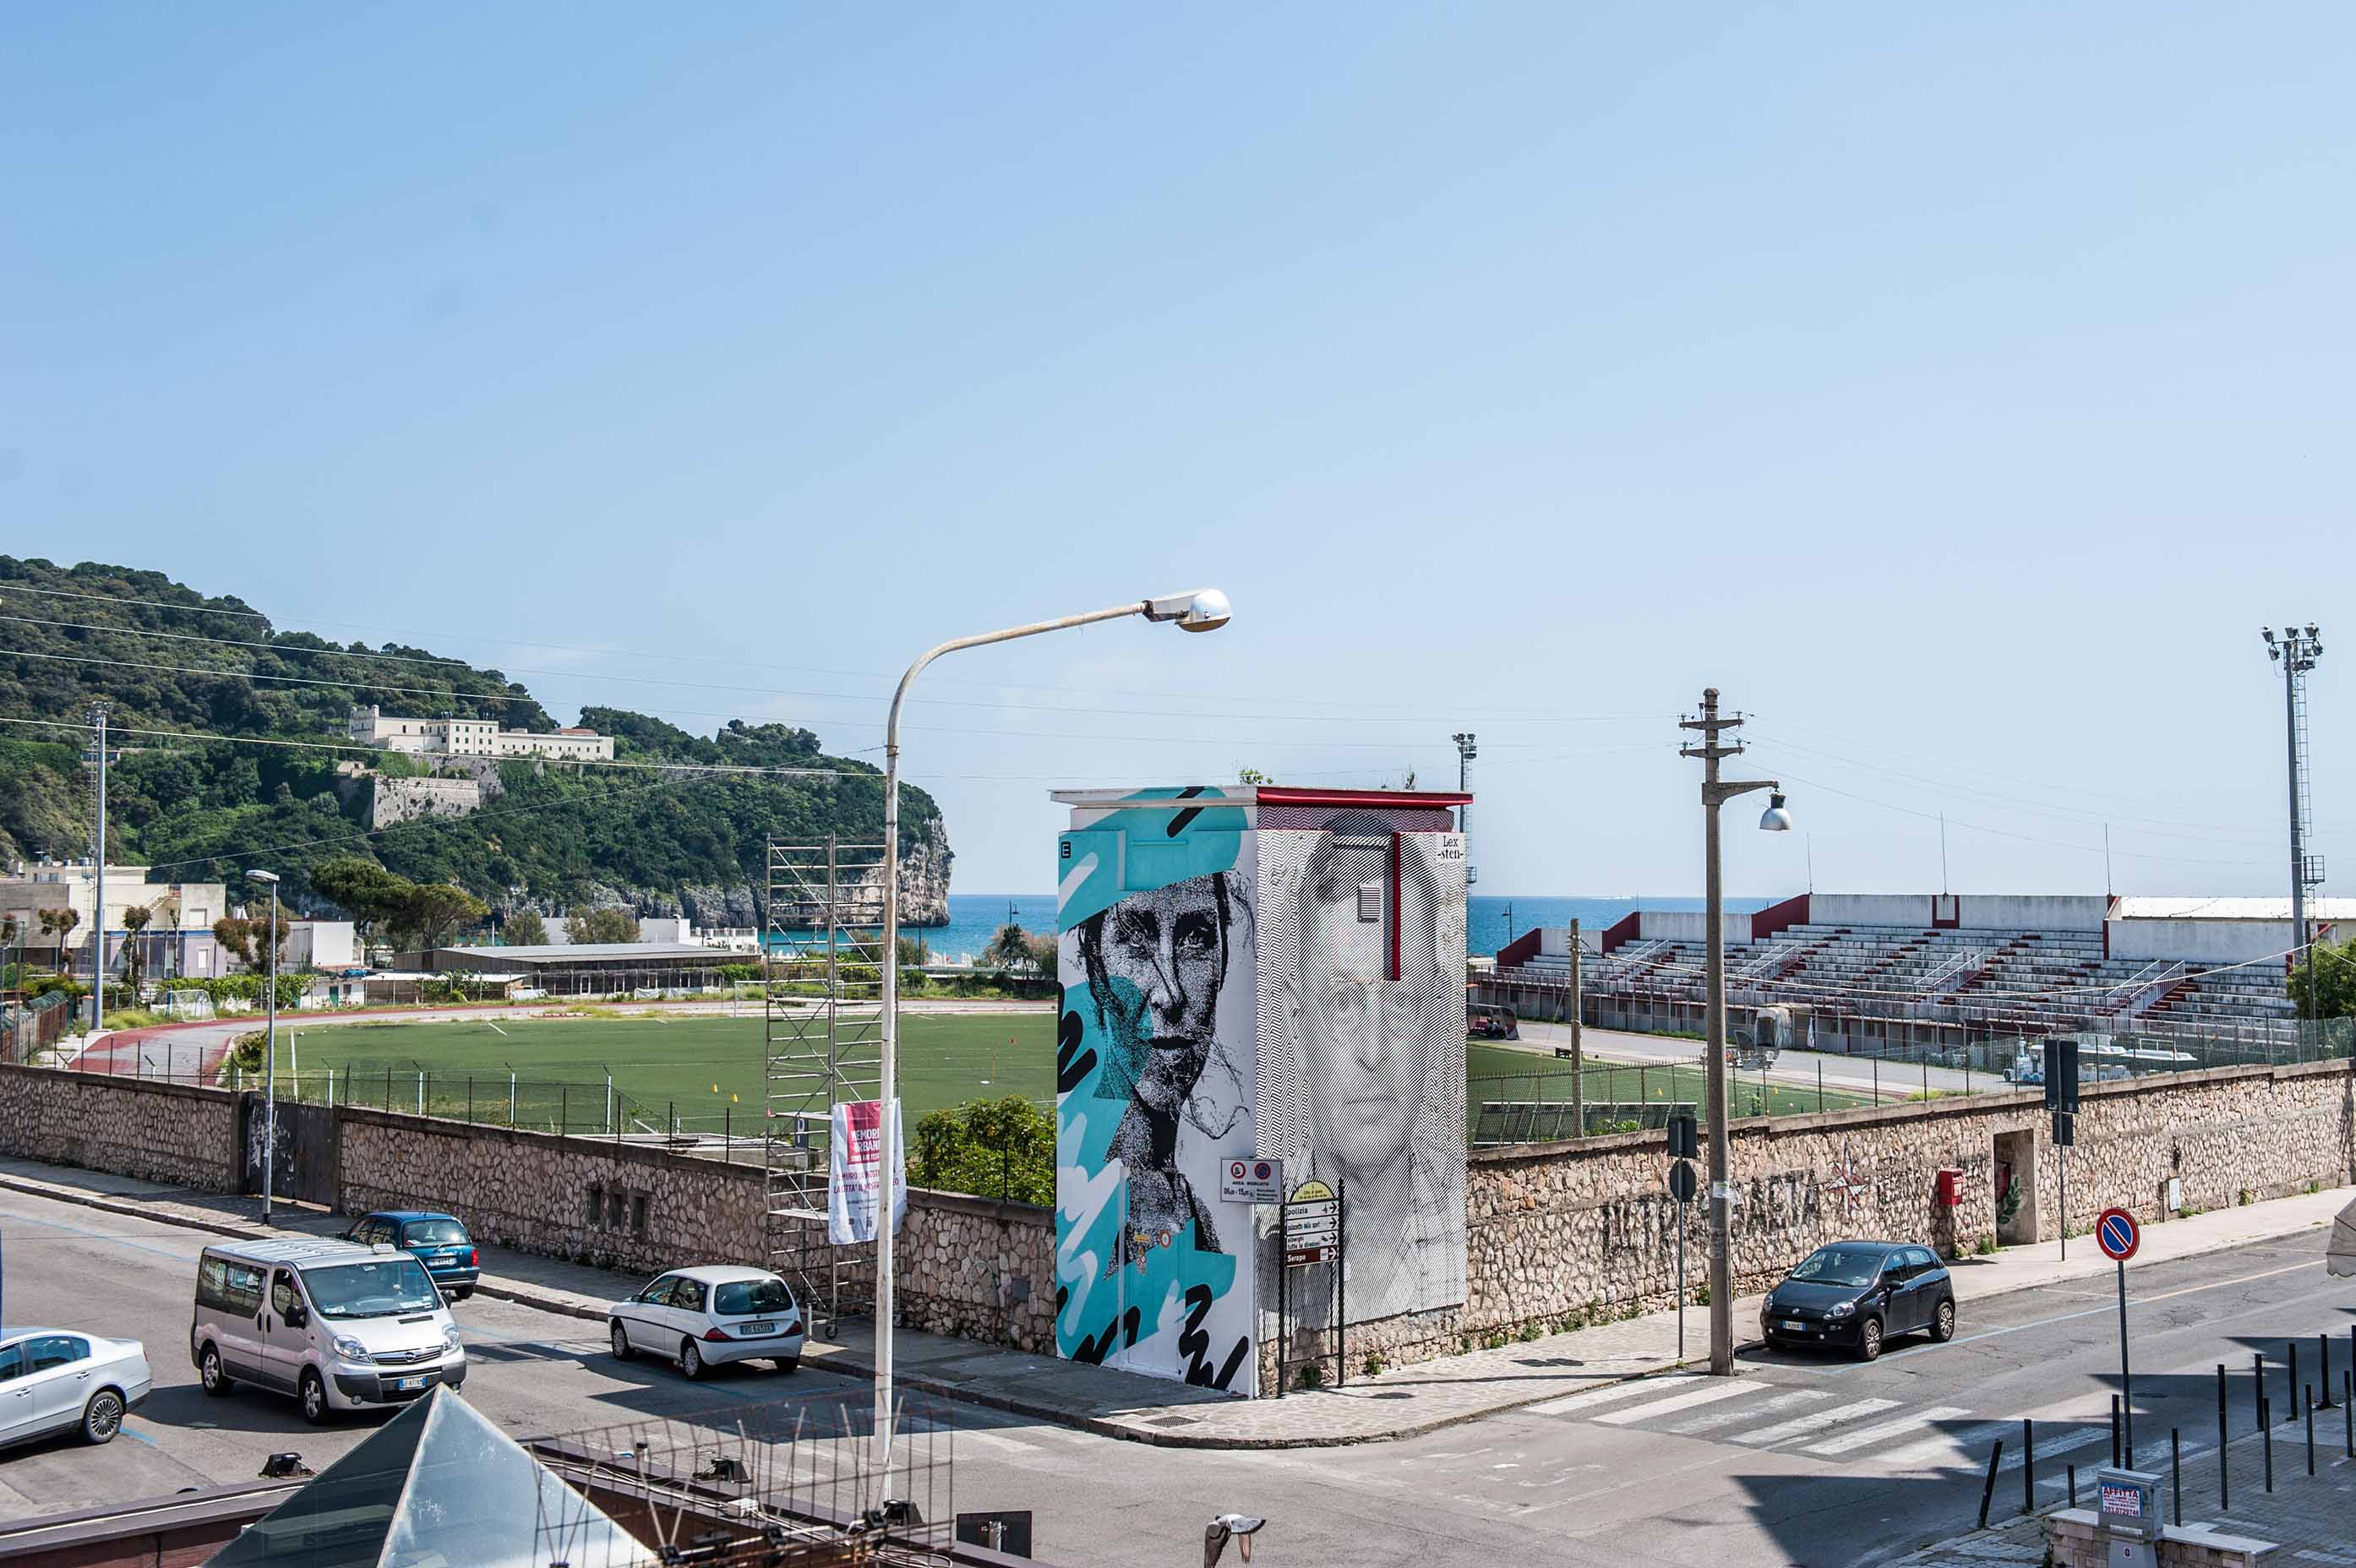 Eime in Gaeta / Photo: Flavia Fiengo